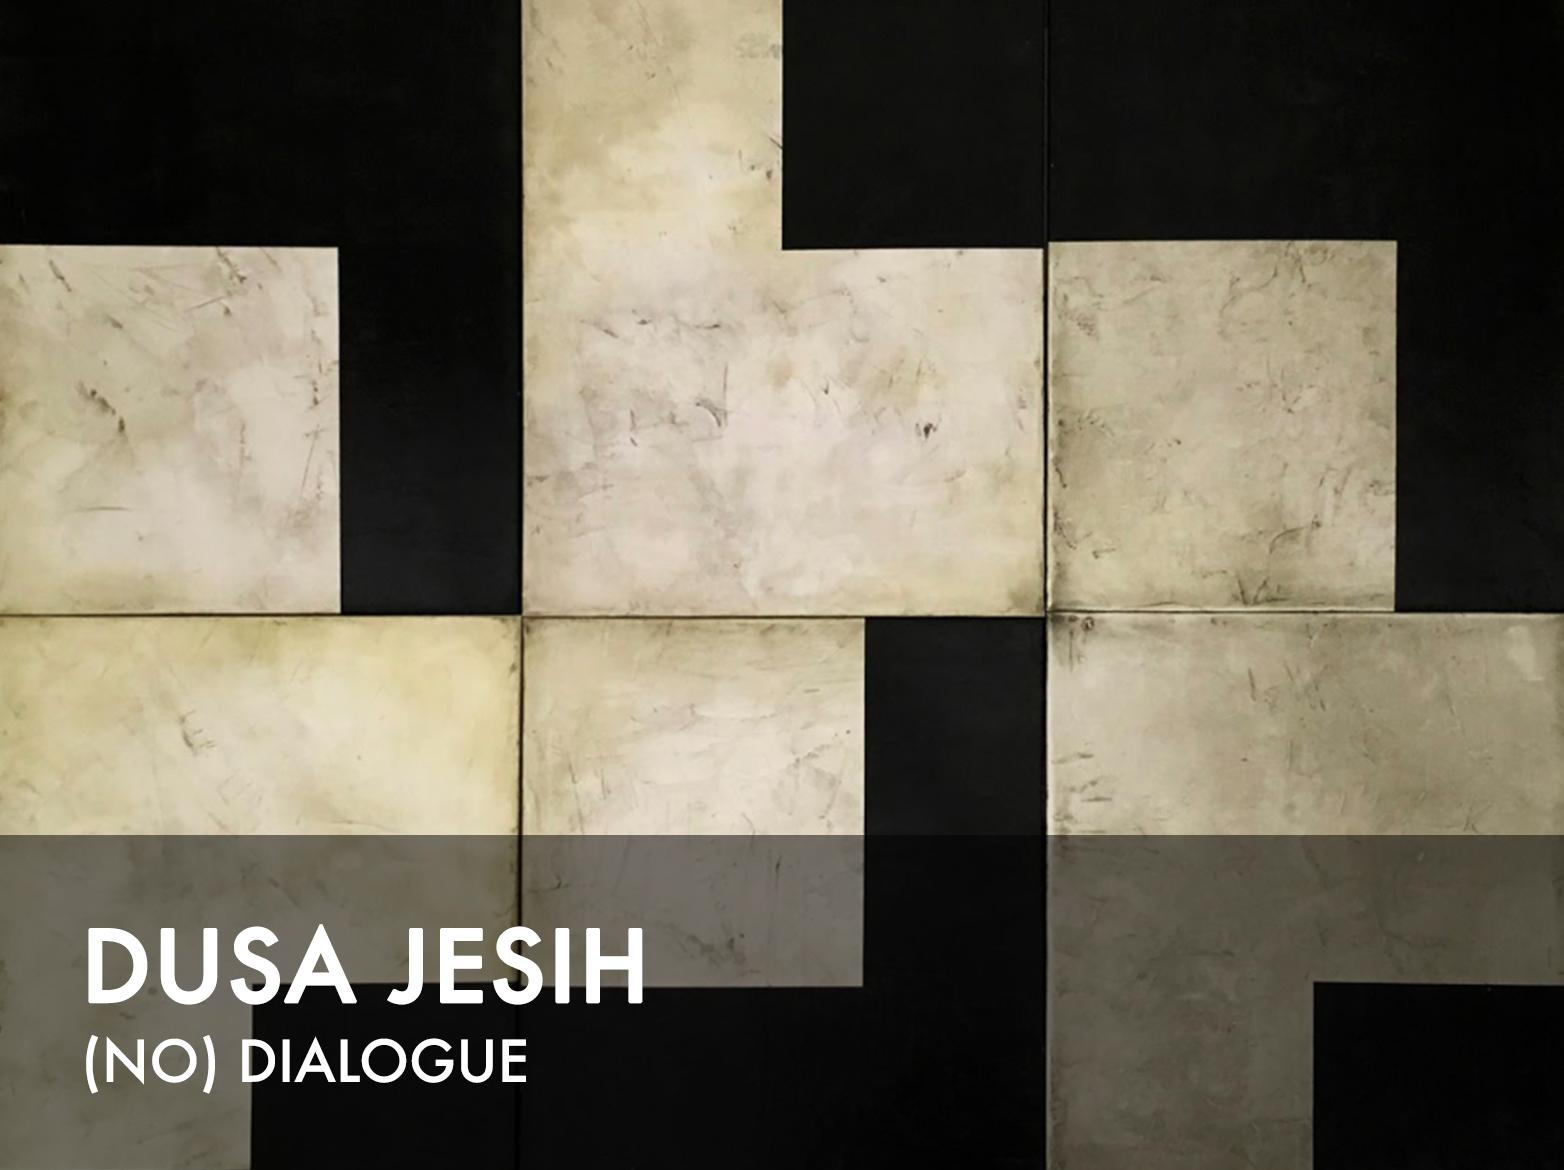 dusa_jesih_no_dialogue